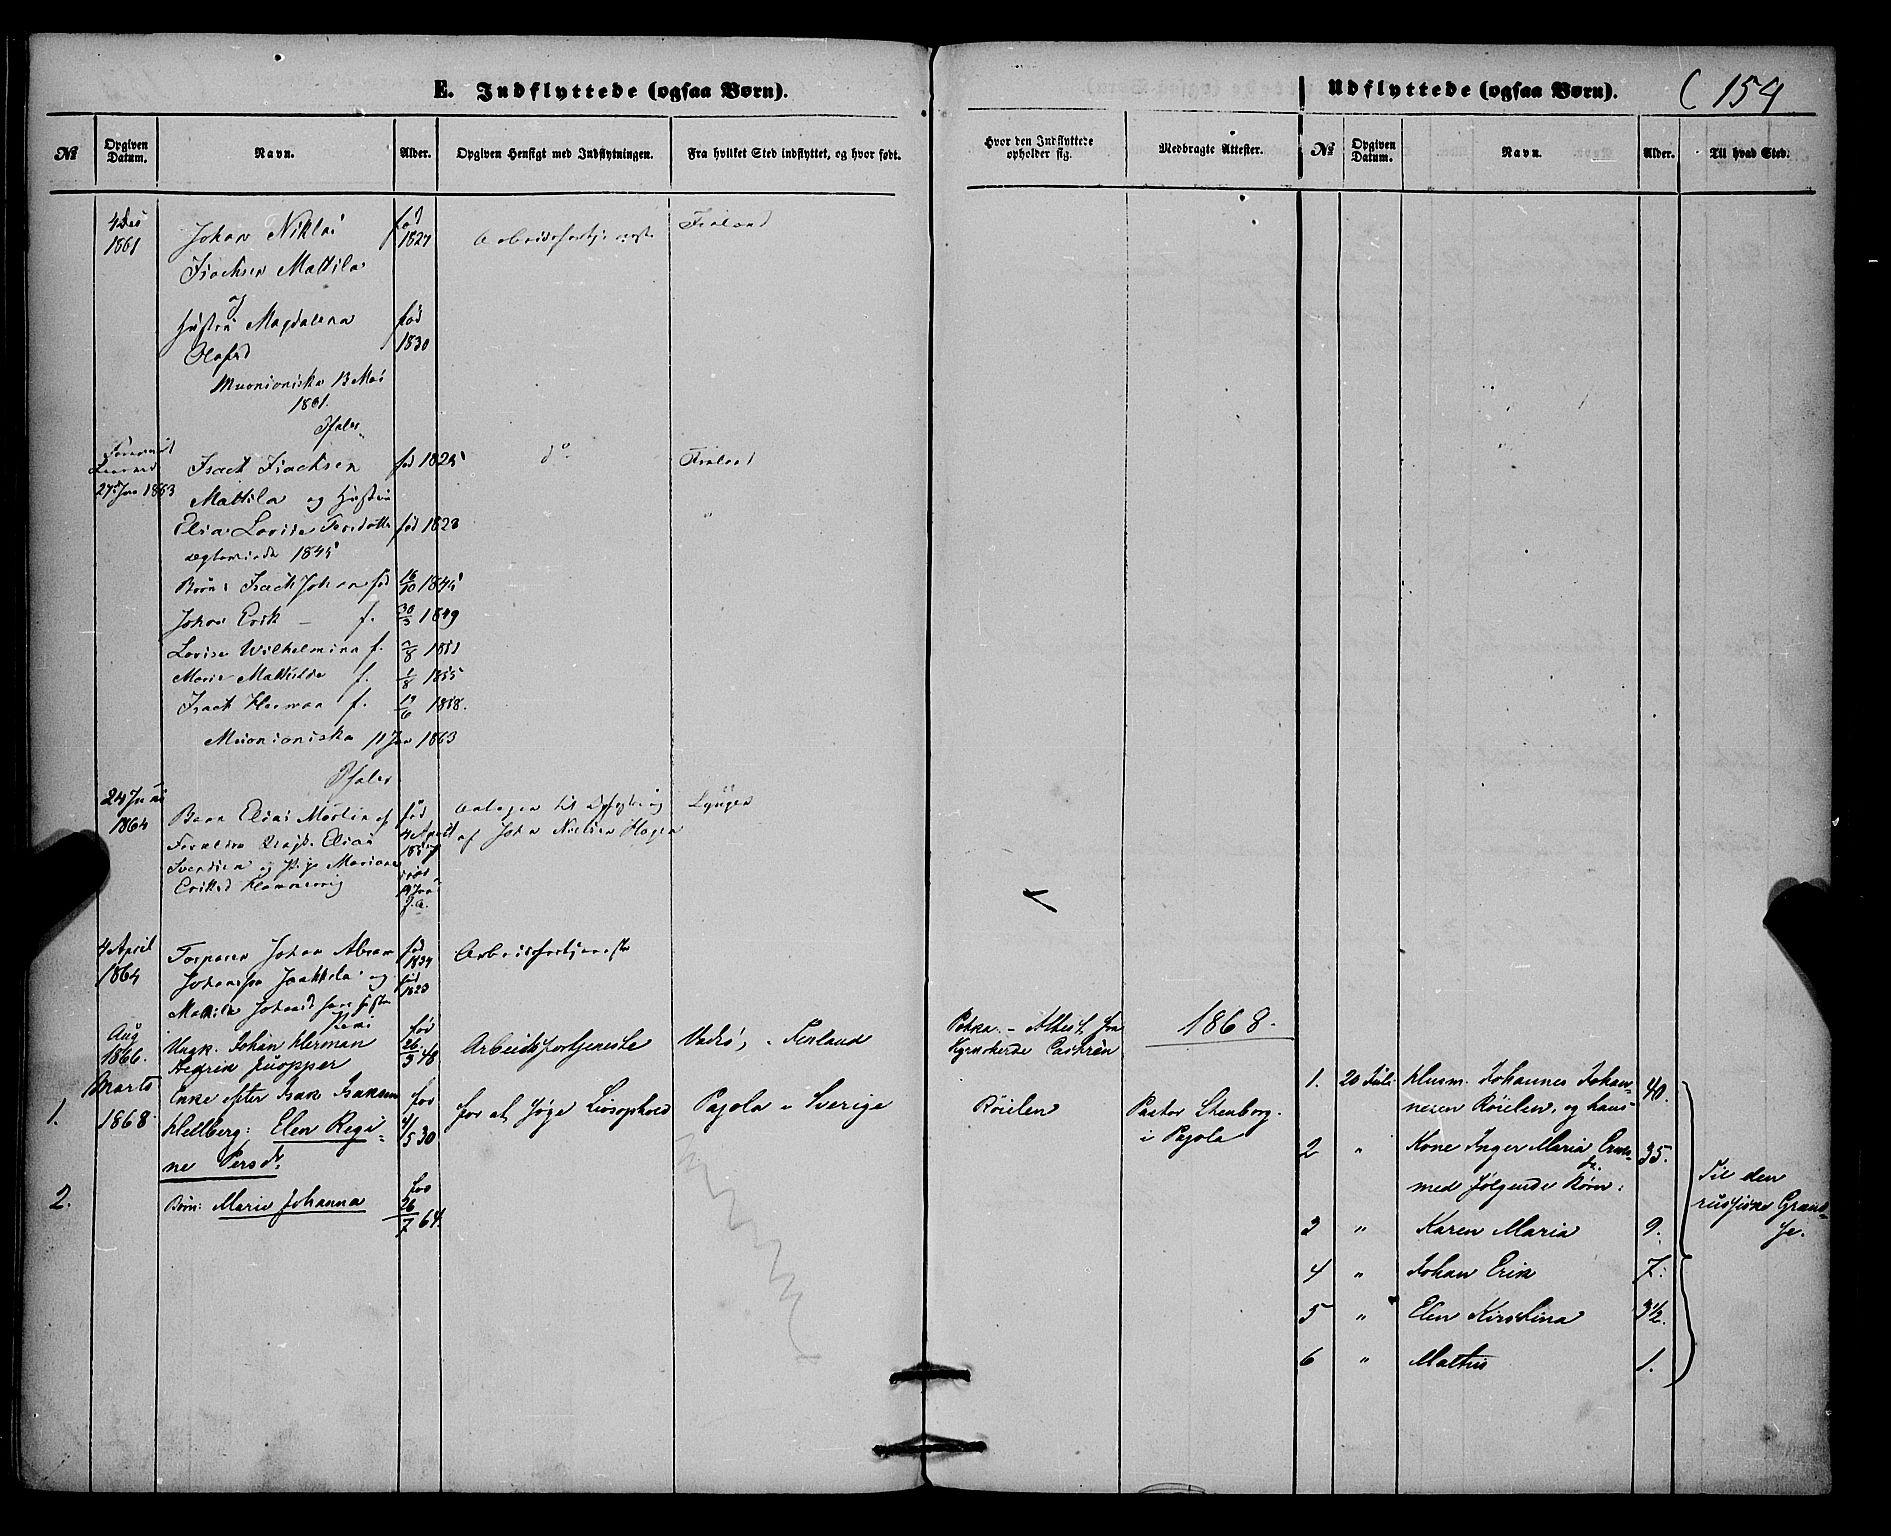 SATØ, Skjervøy sokneprestkontor, H/Ha/Haa/L0013kirke: Ministerialbok nr. 13, 1863-1877, s. 154